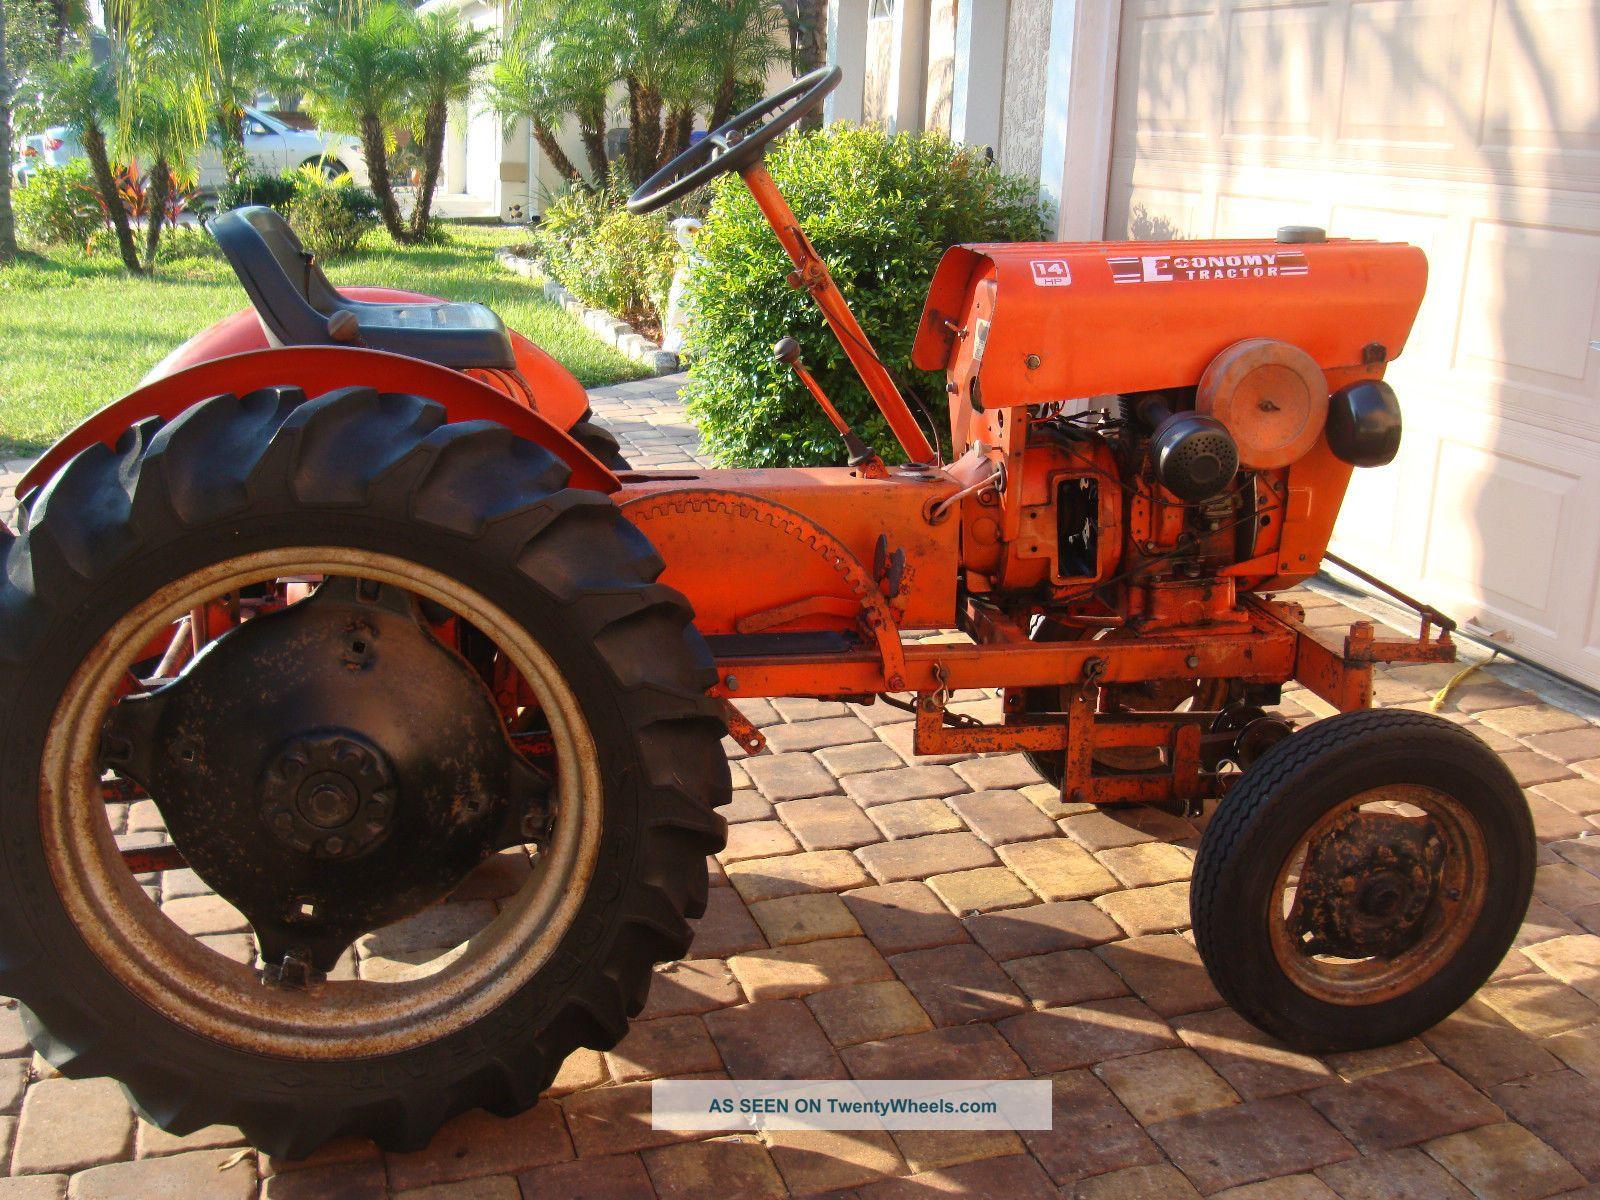 Vintage 1972 Power King Economy Tractor Antique & Vintage Equip Parts photo